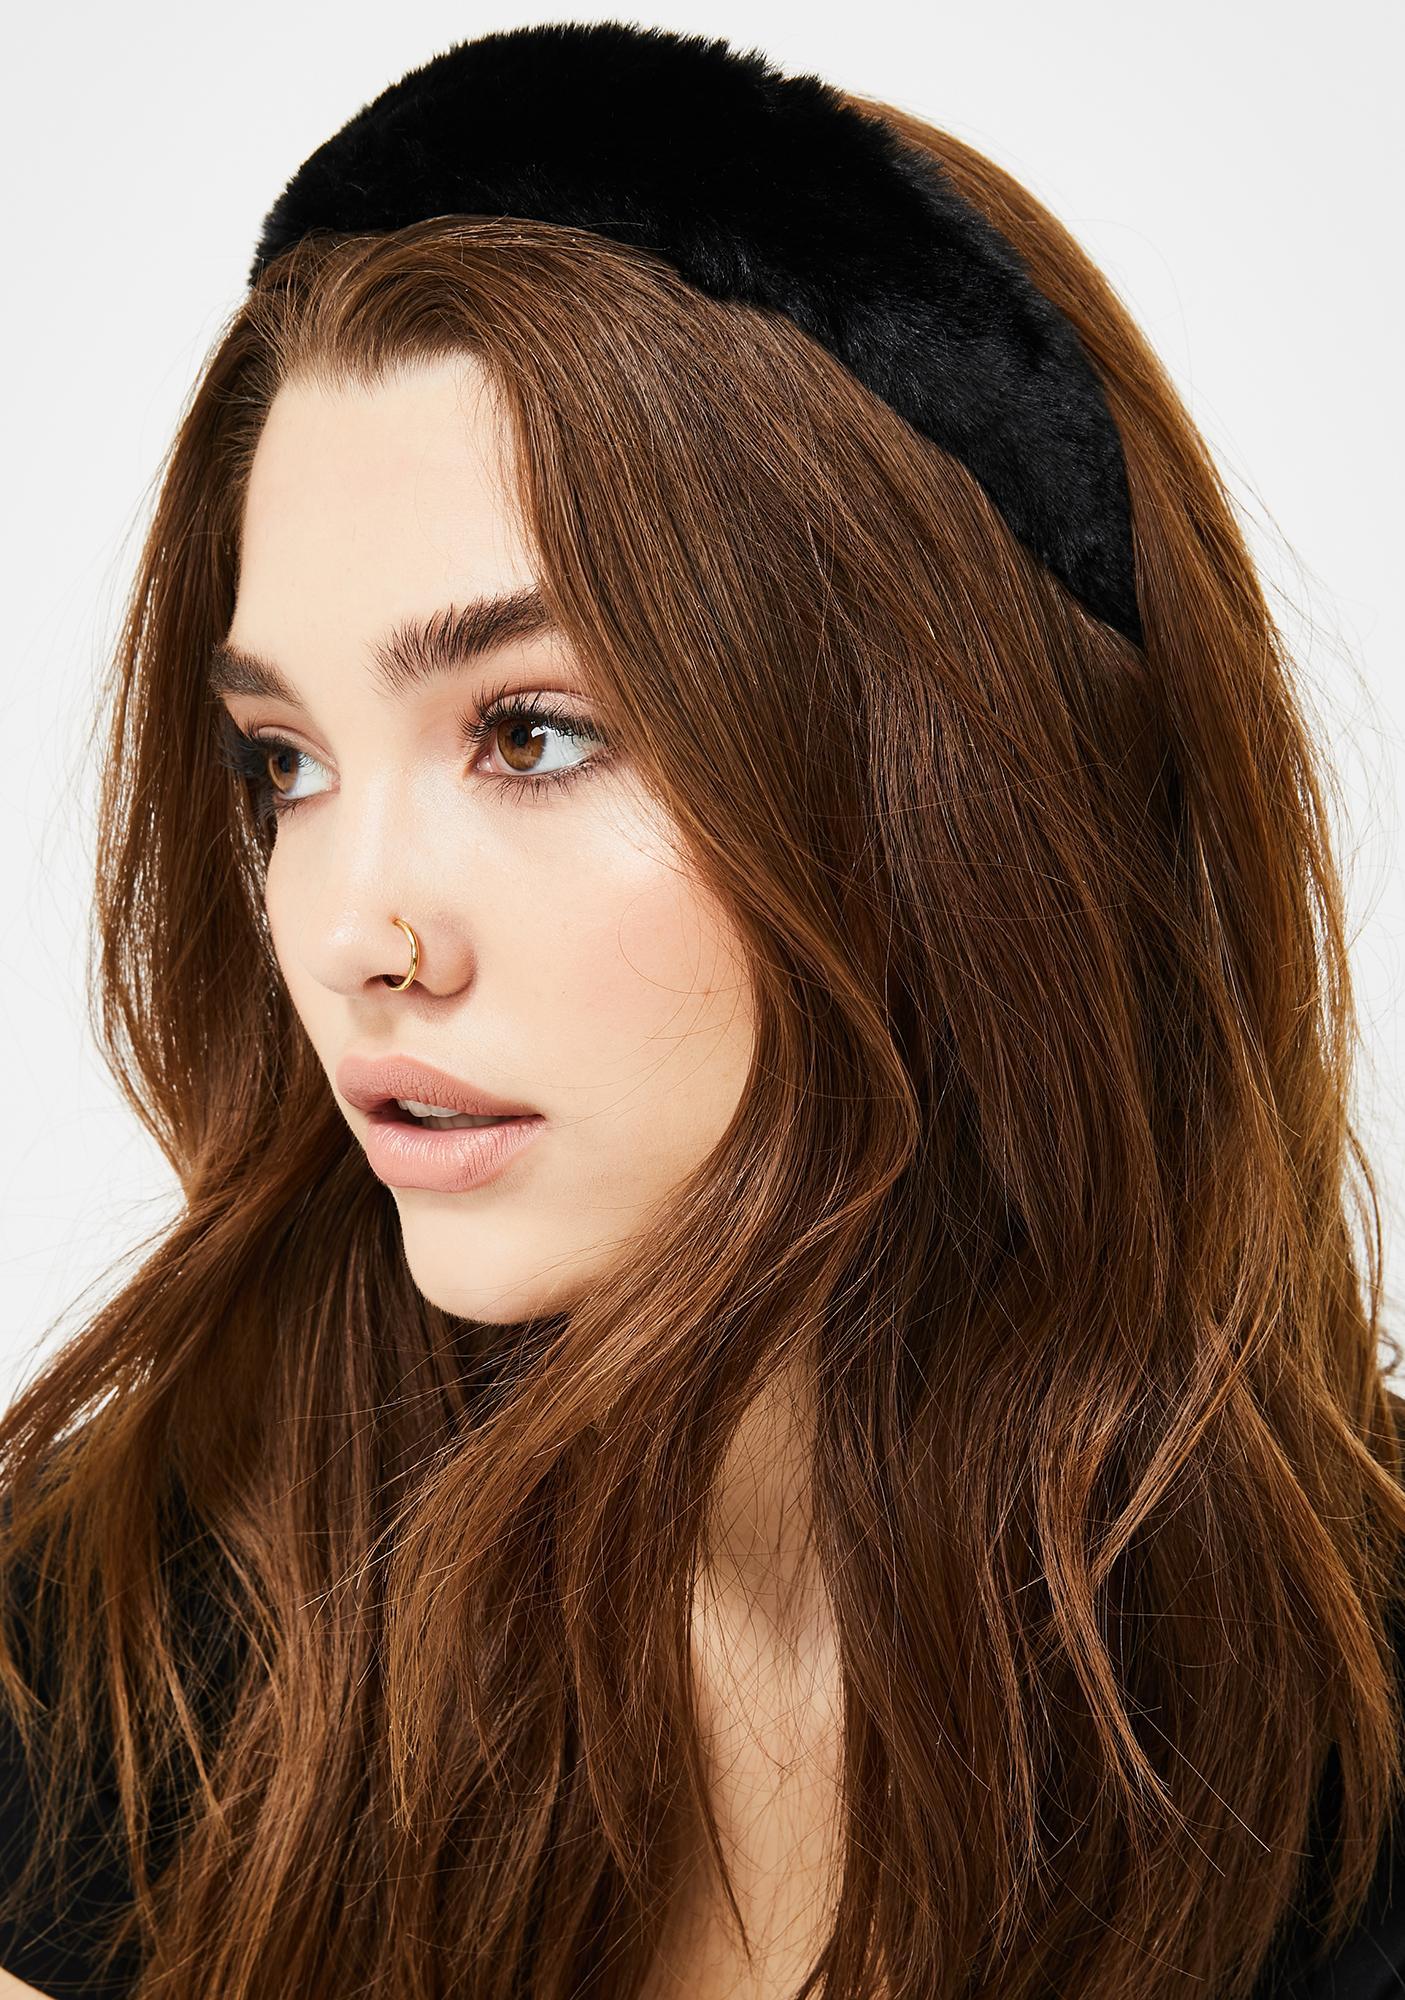 Cuties Only Fuzzy Headband